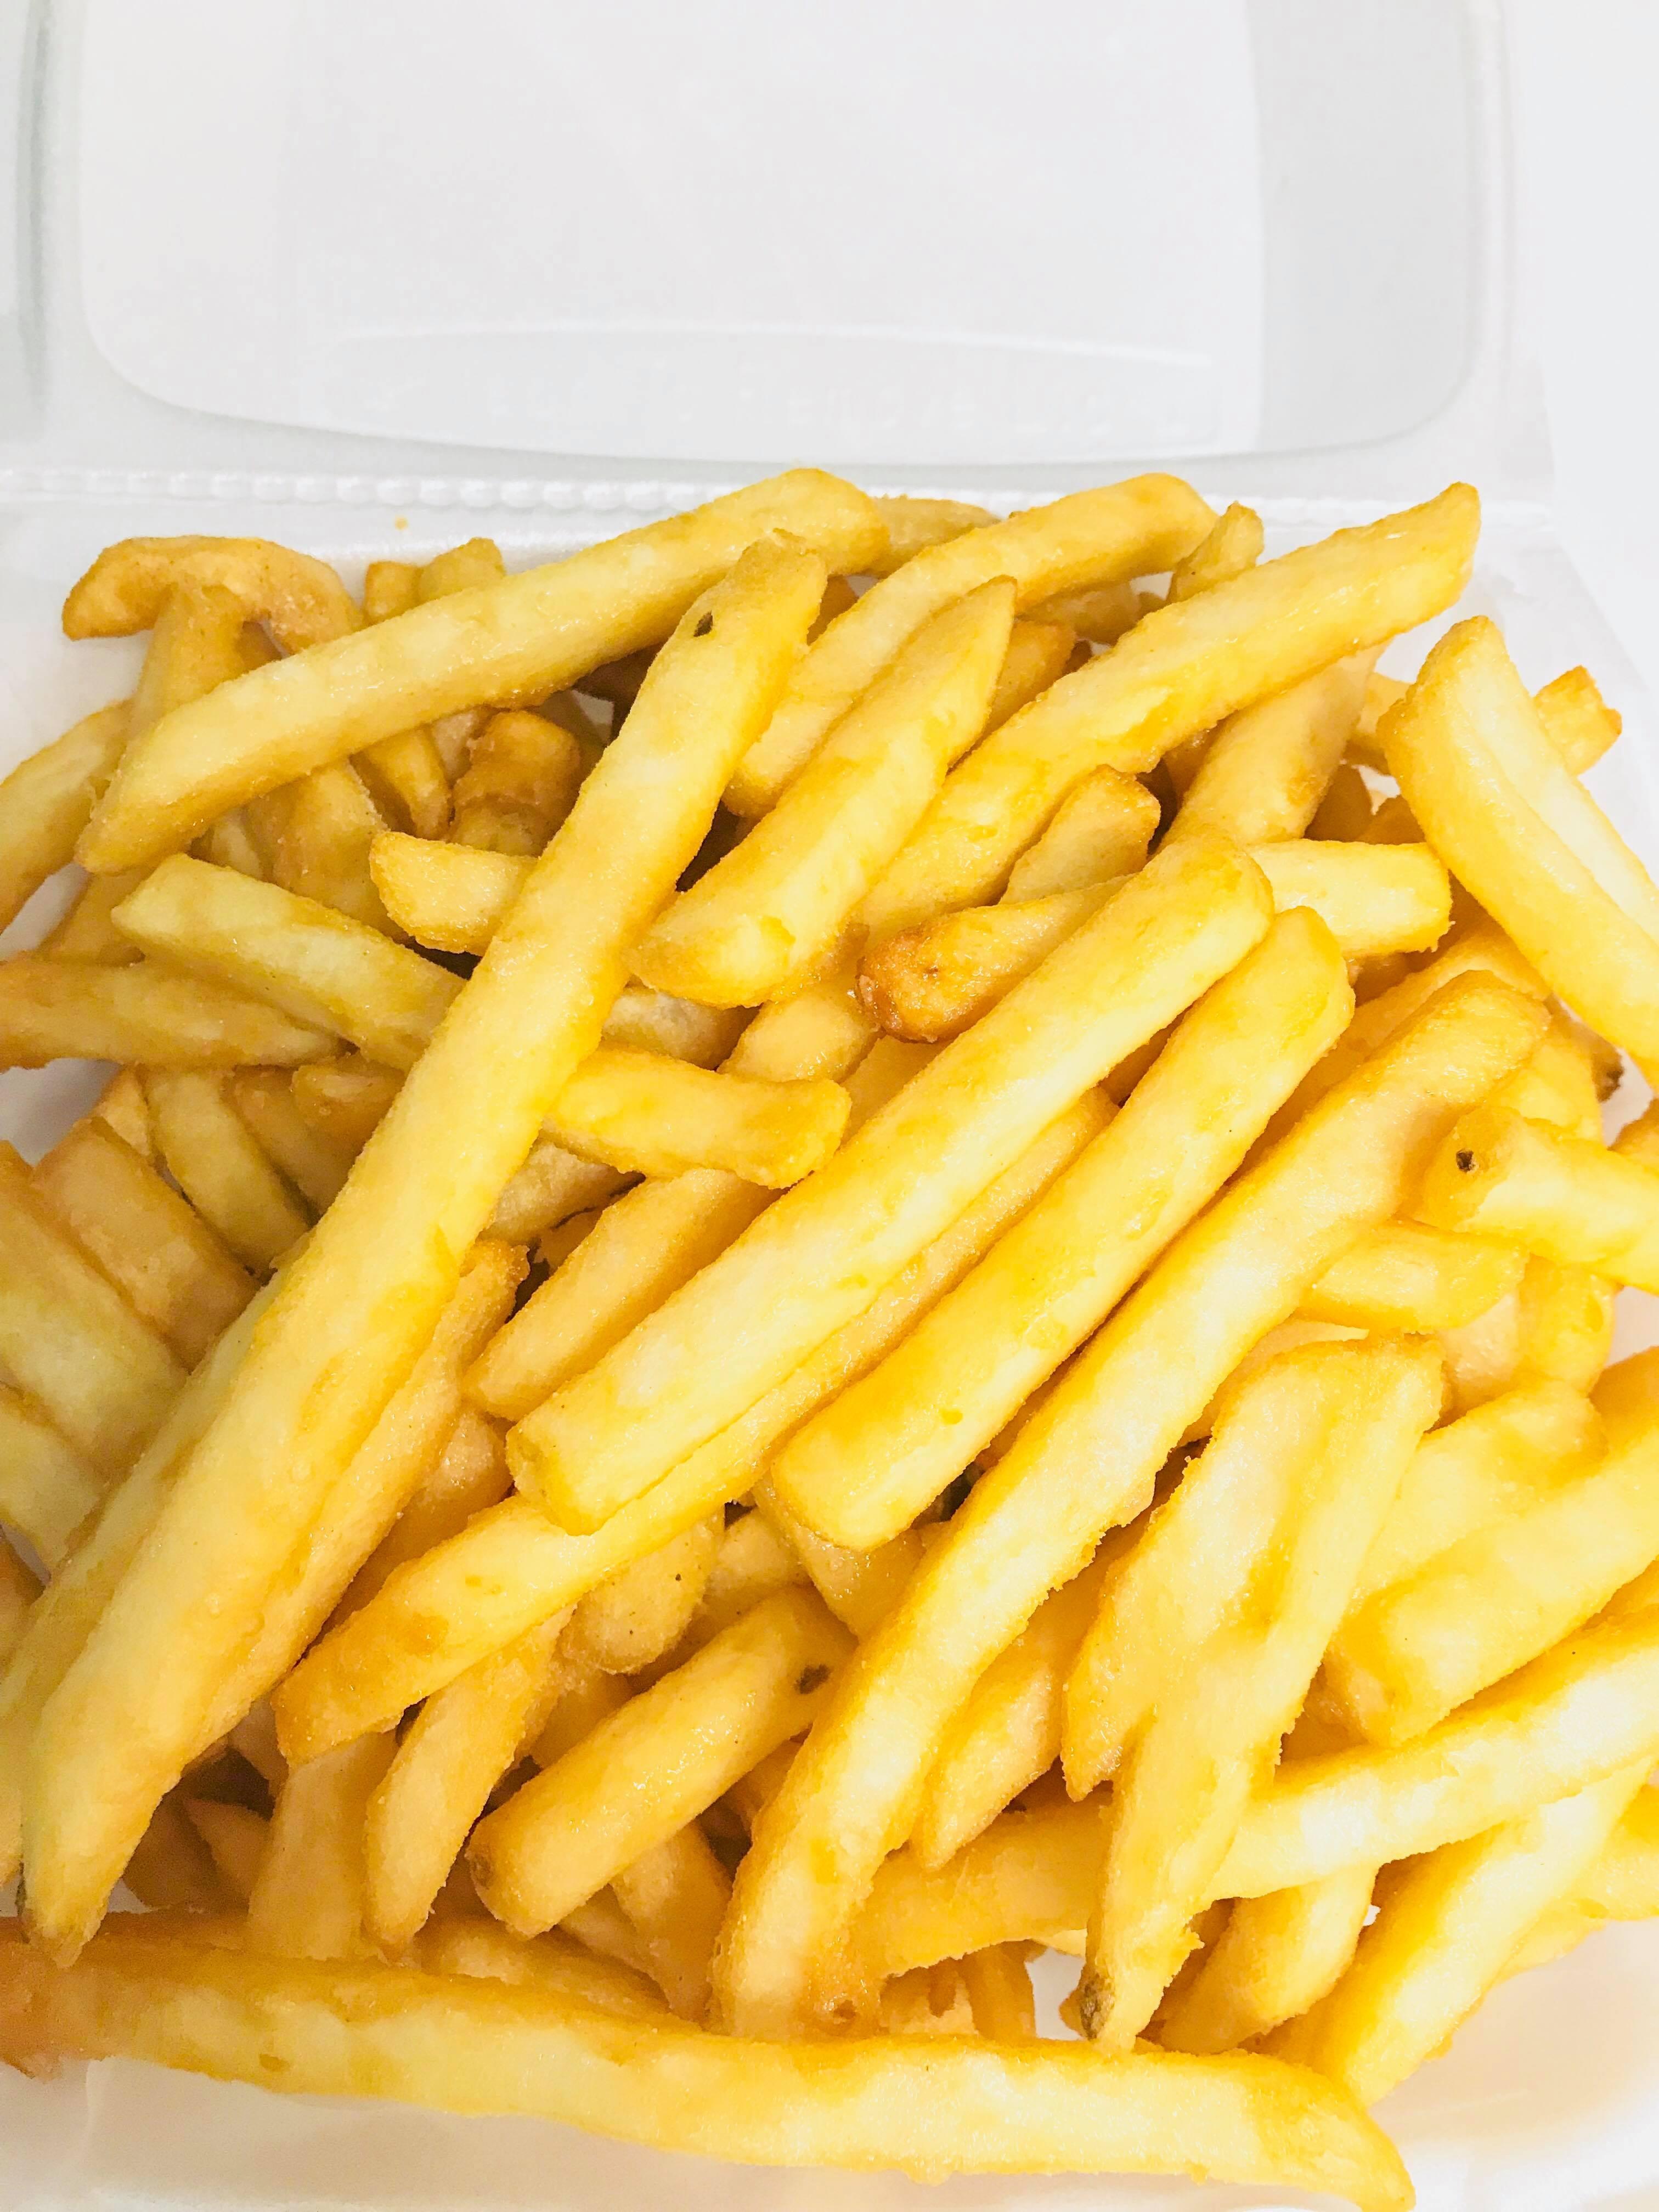 Fries 2